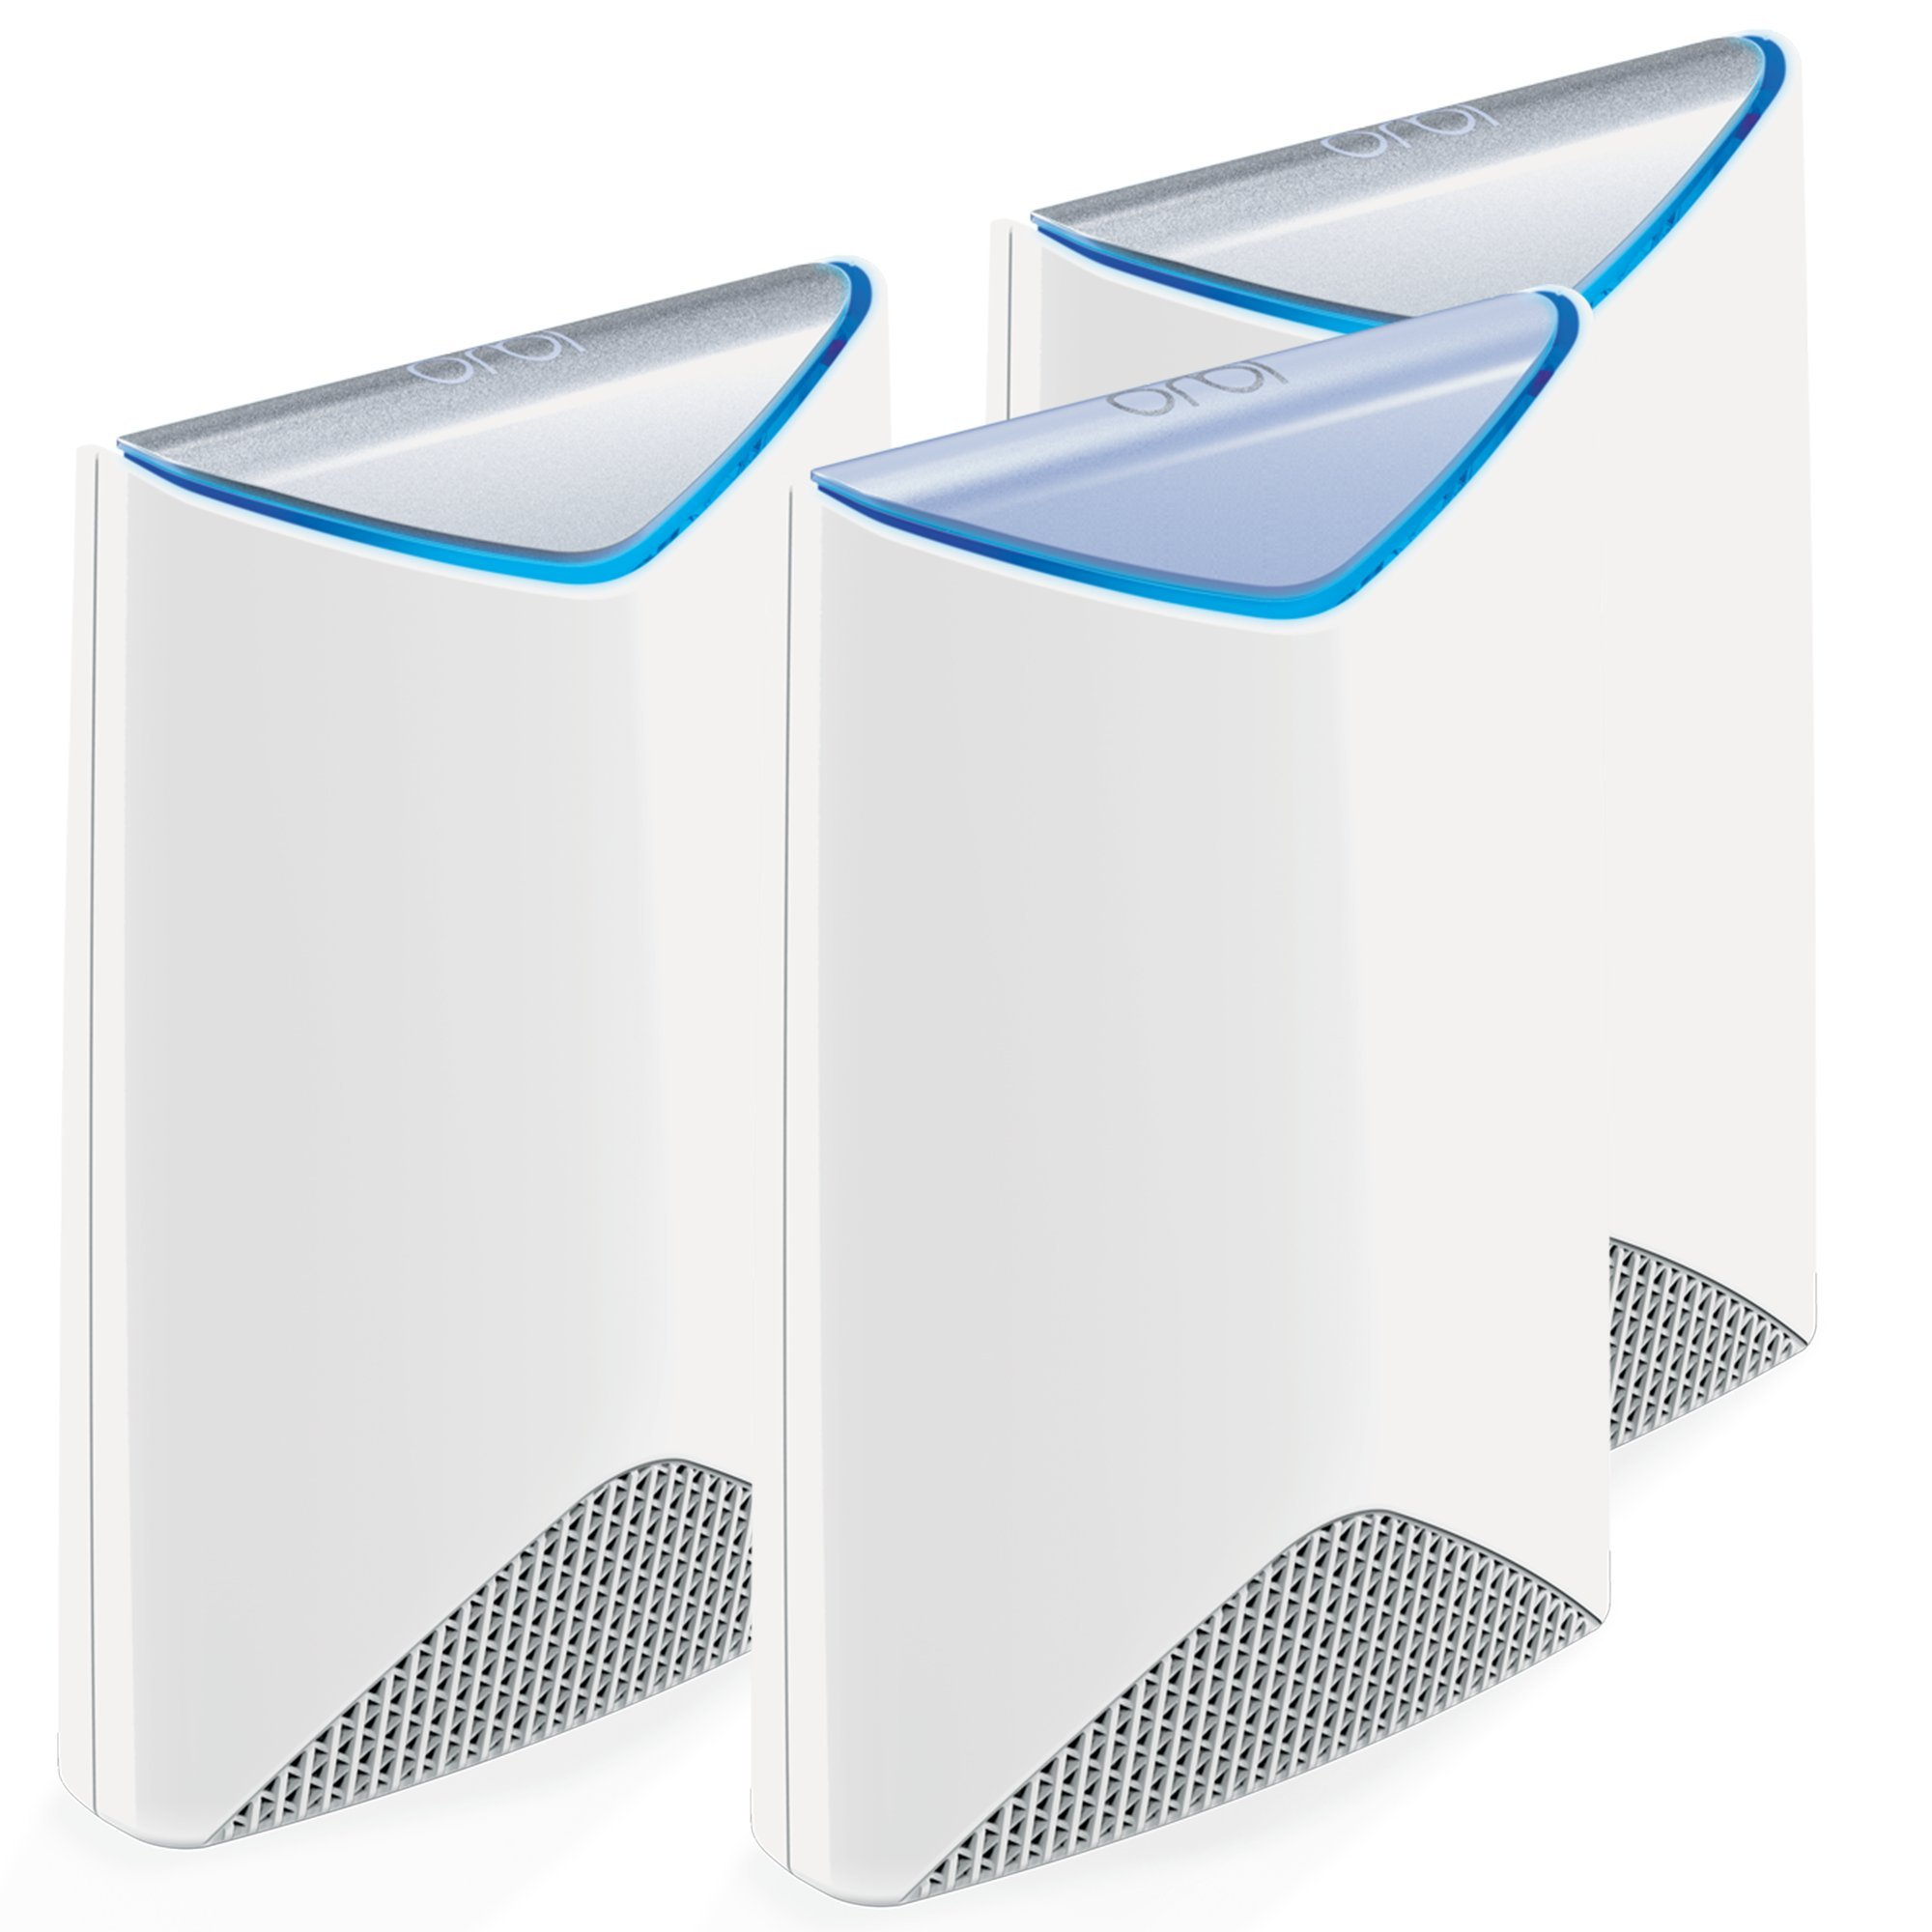 Orbi Pro By Netgear Ac3000 Tri Band Wifi System For